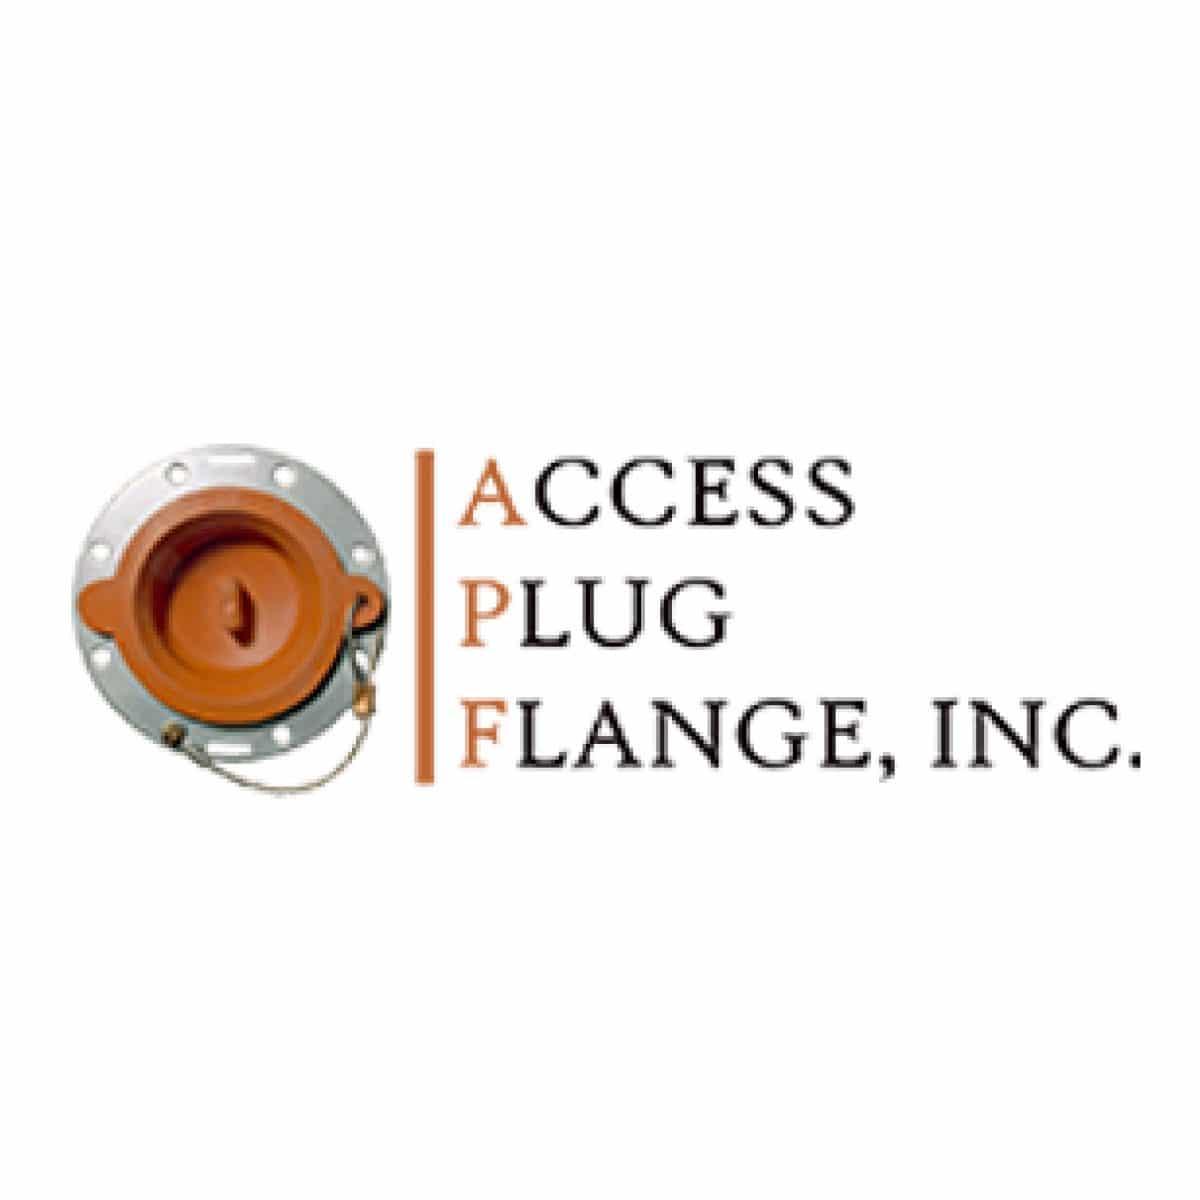 Access Plug Flange, Inc